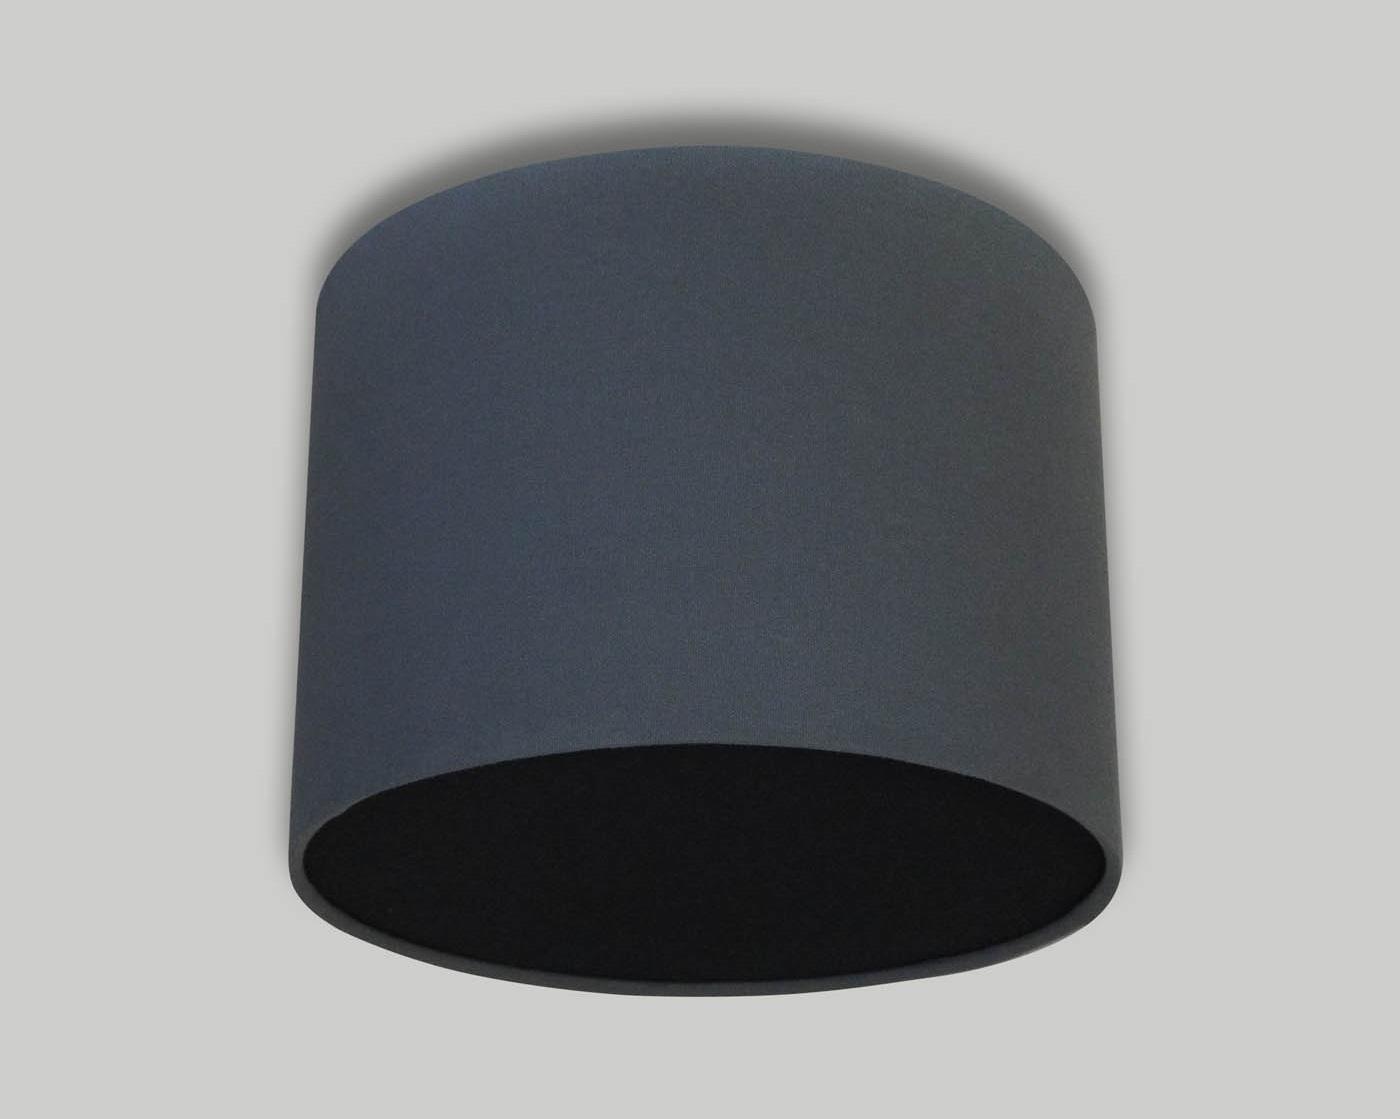 Dark Grey Ceiling Drum Lampshade Black Diffuser The